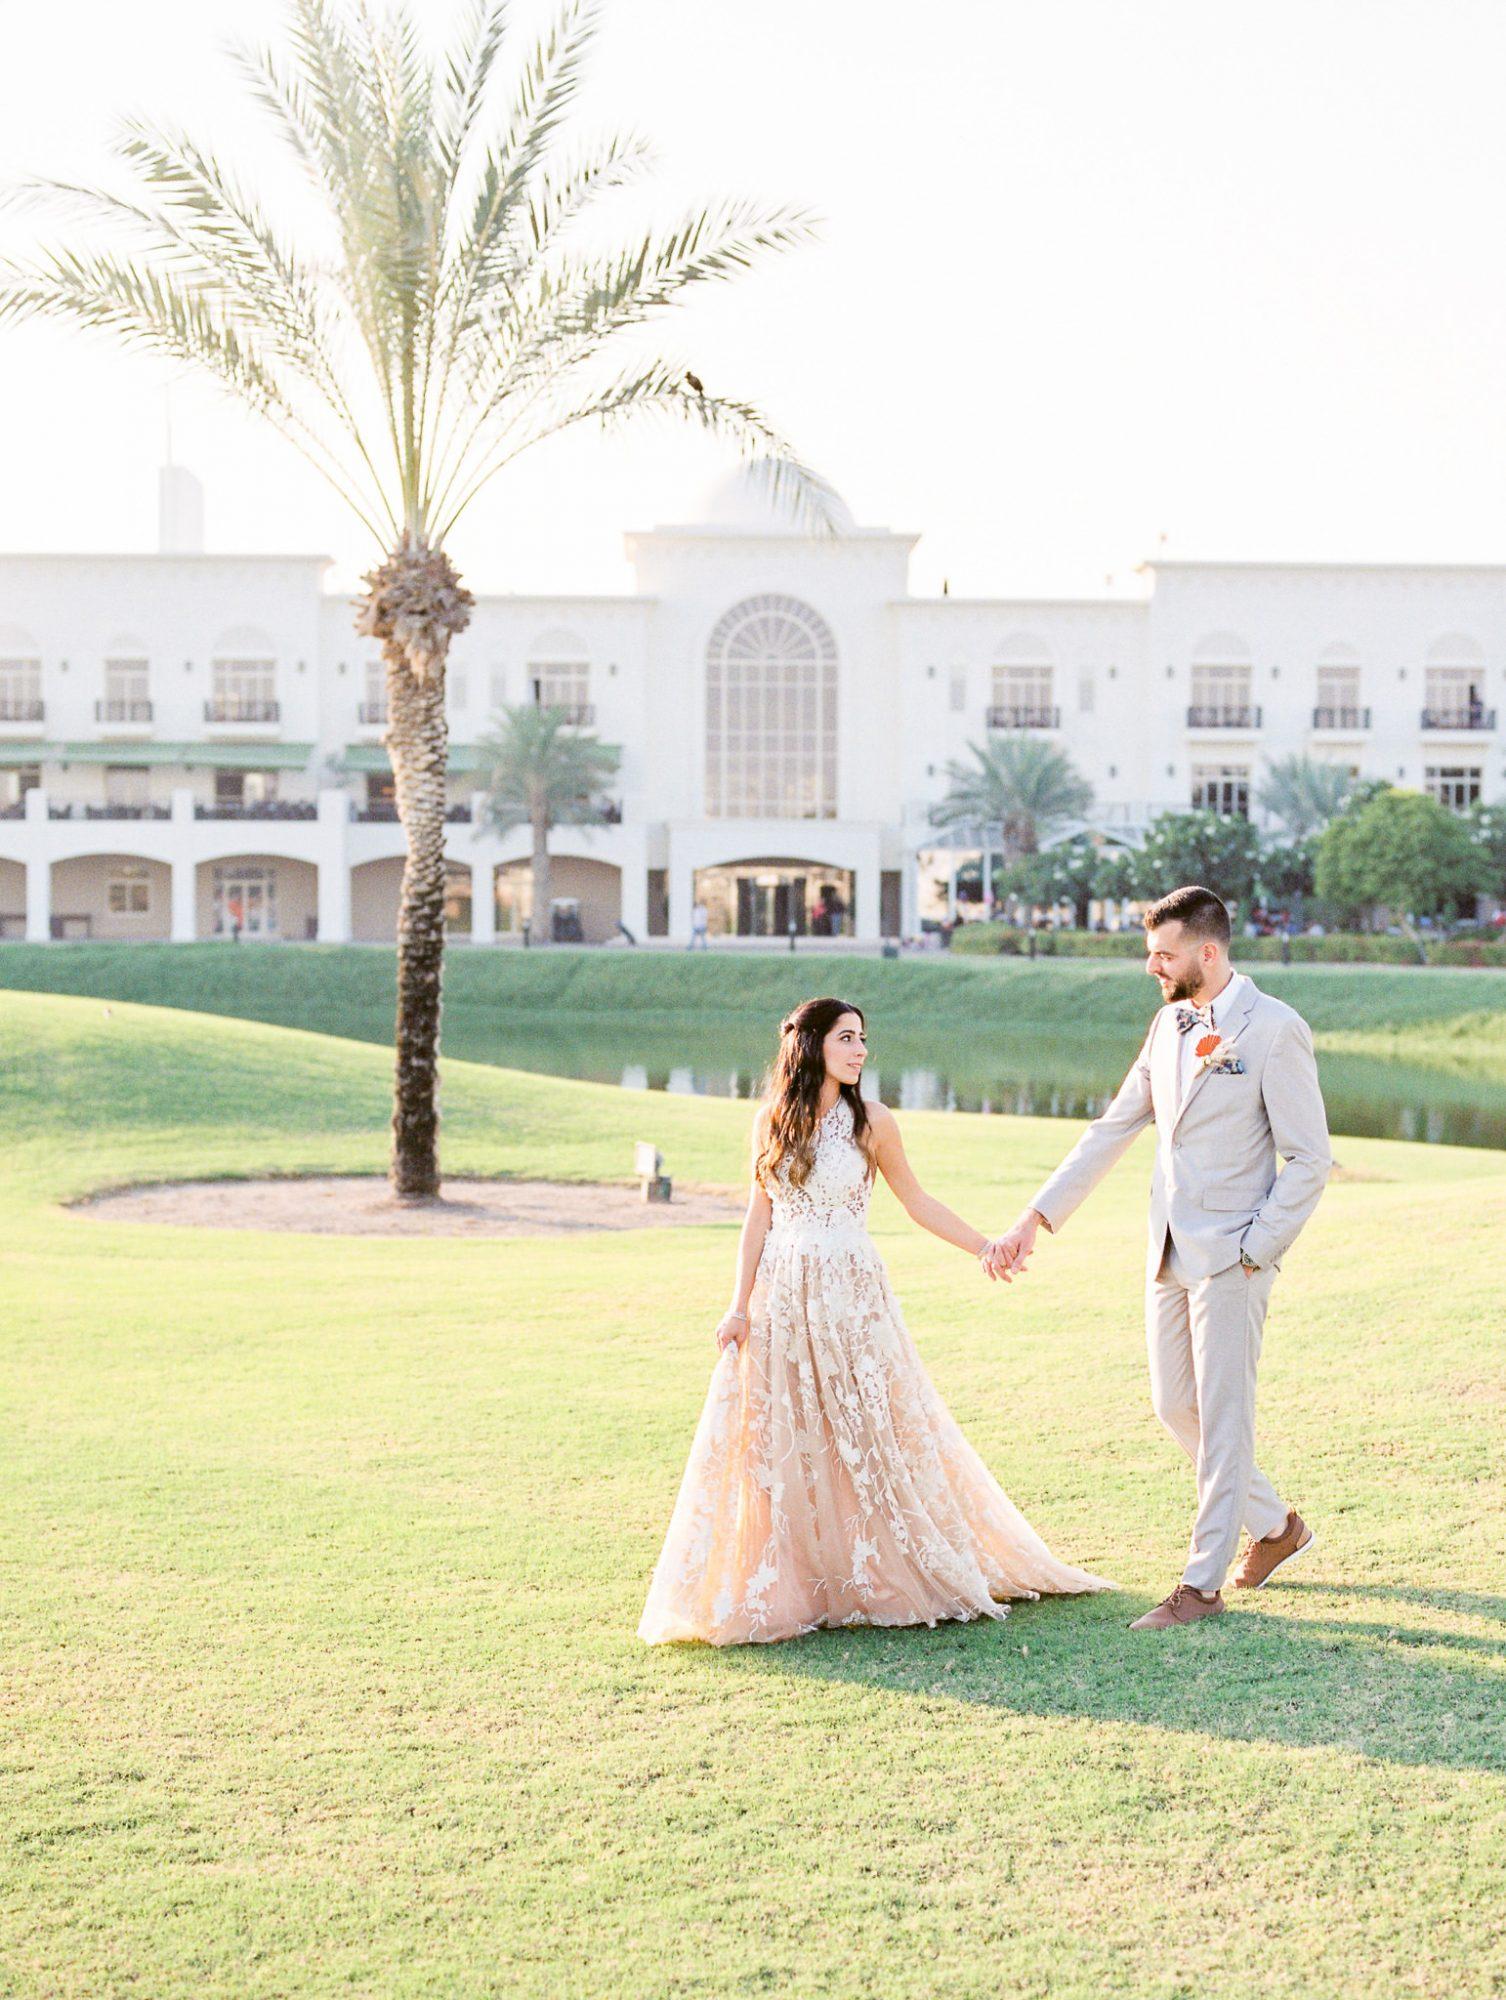 wedding couple walking hand-in-hand across lawn